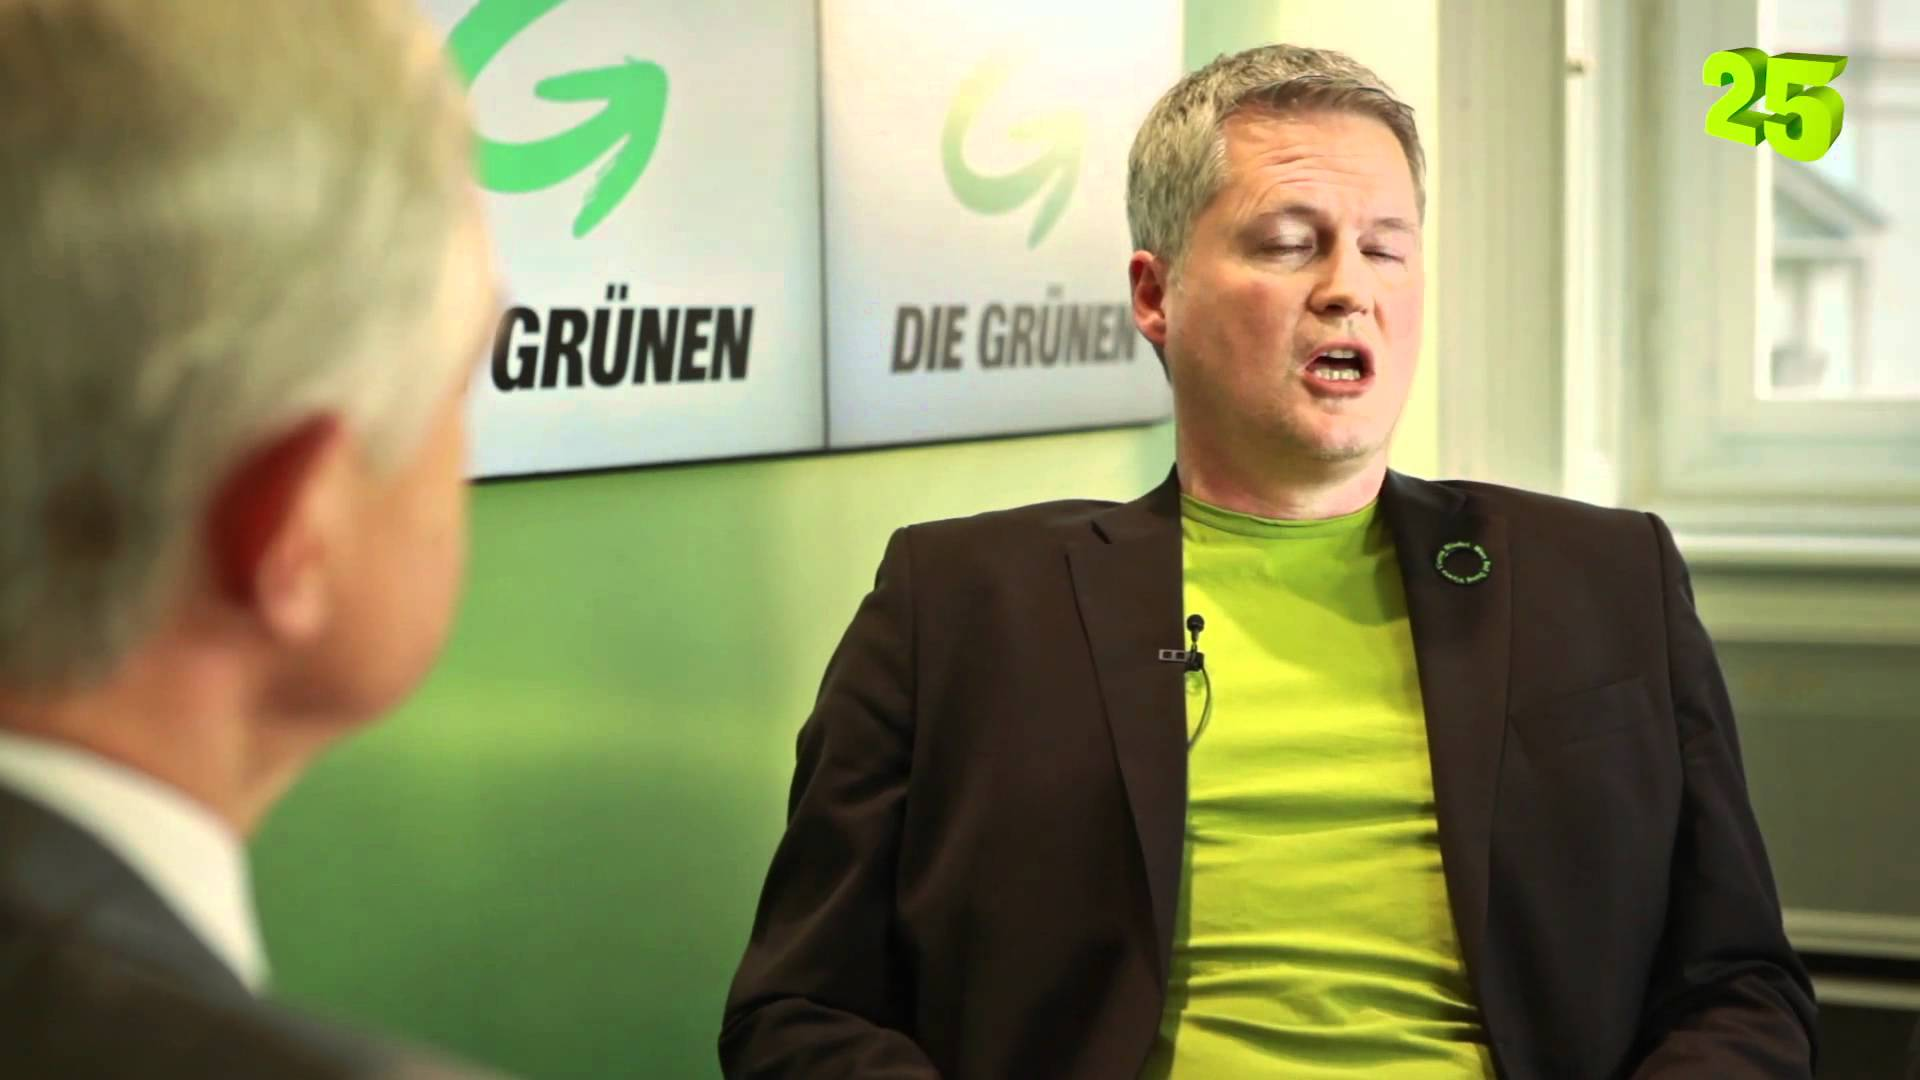 Politiker David Ellensohn von den Grünen